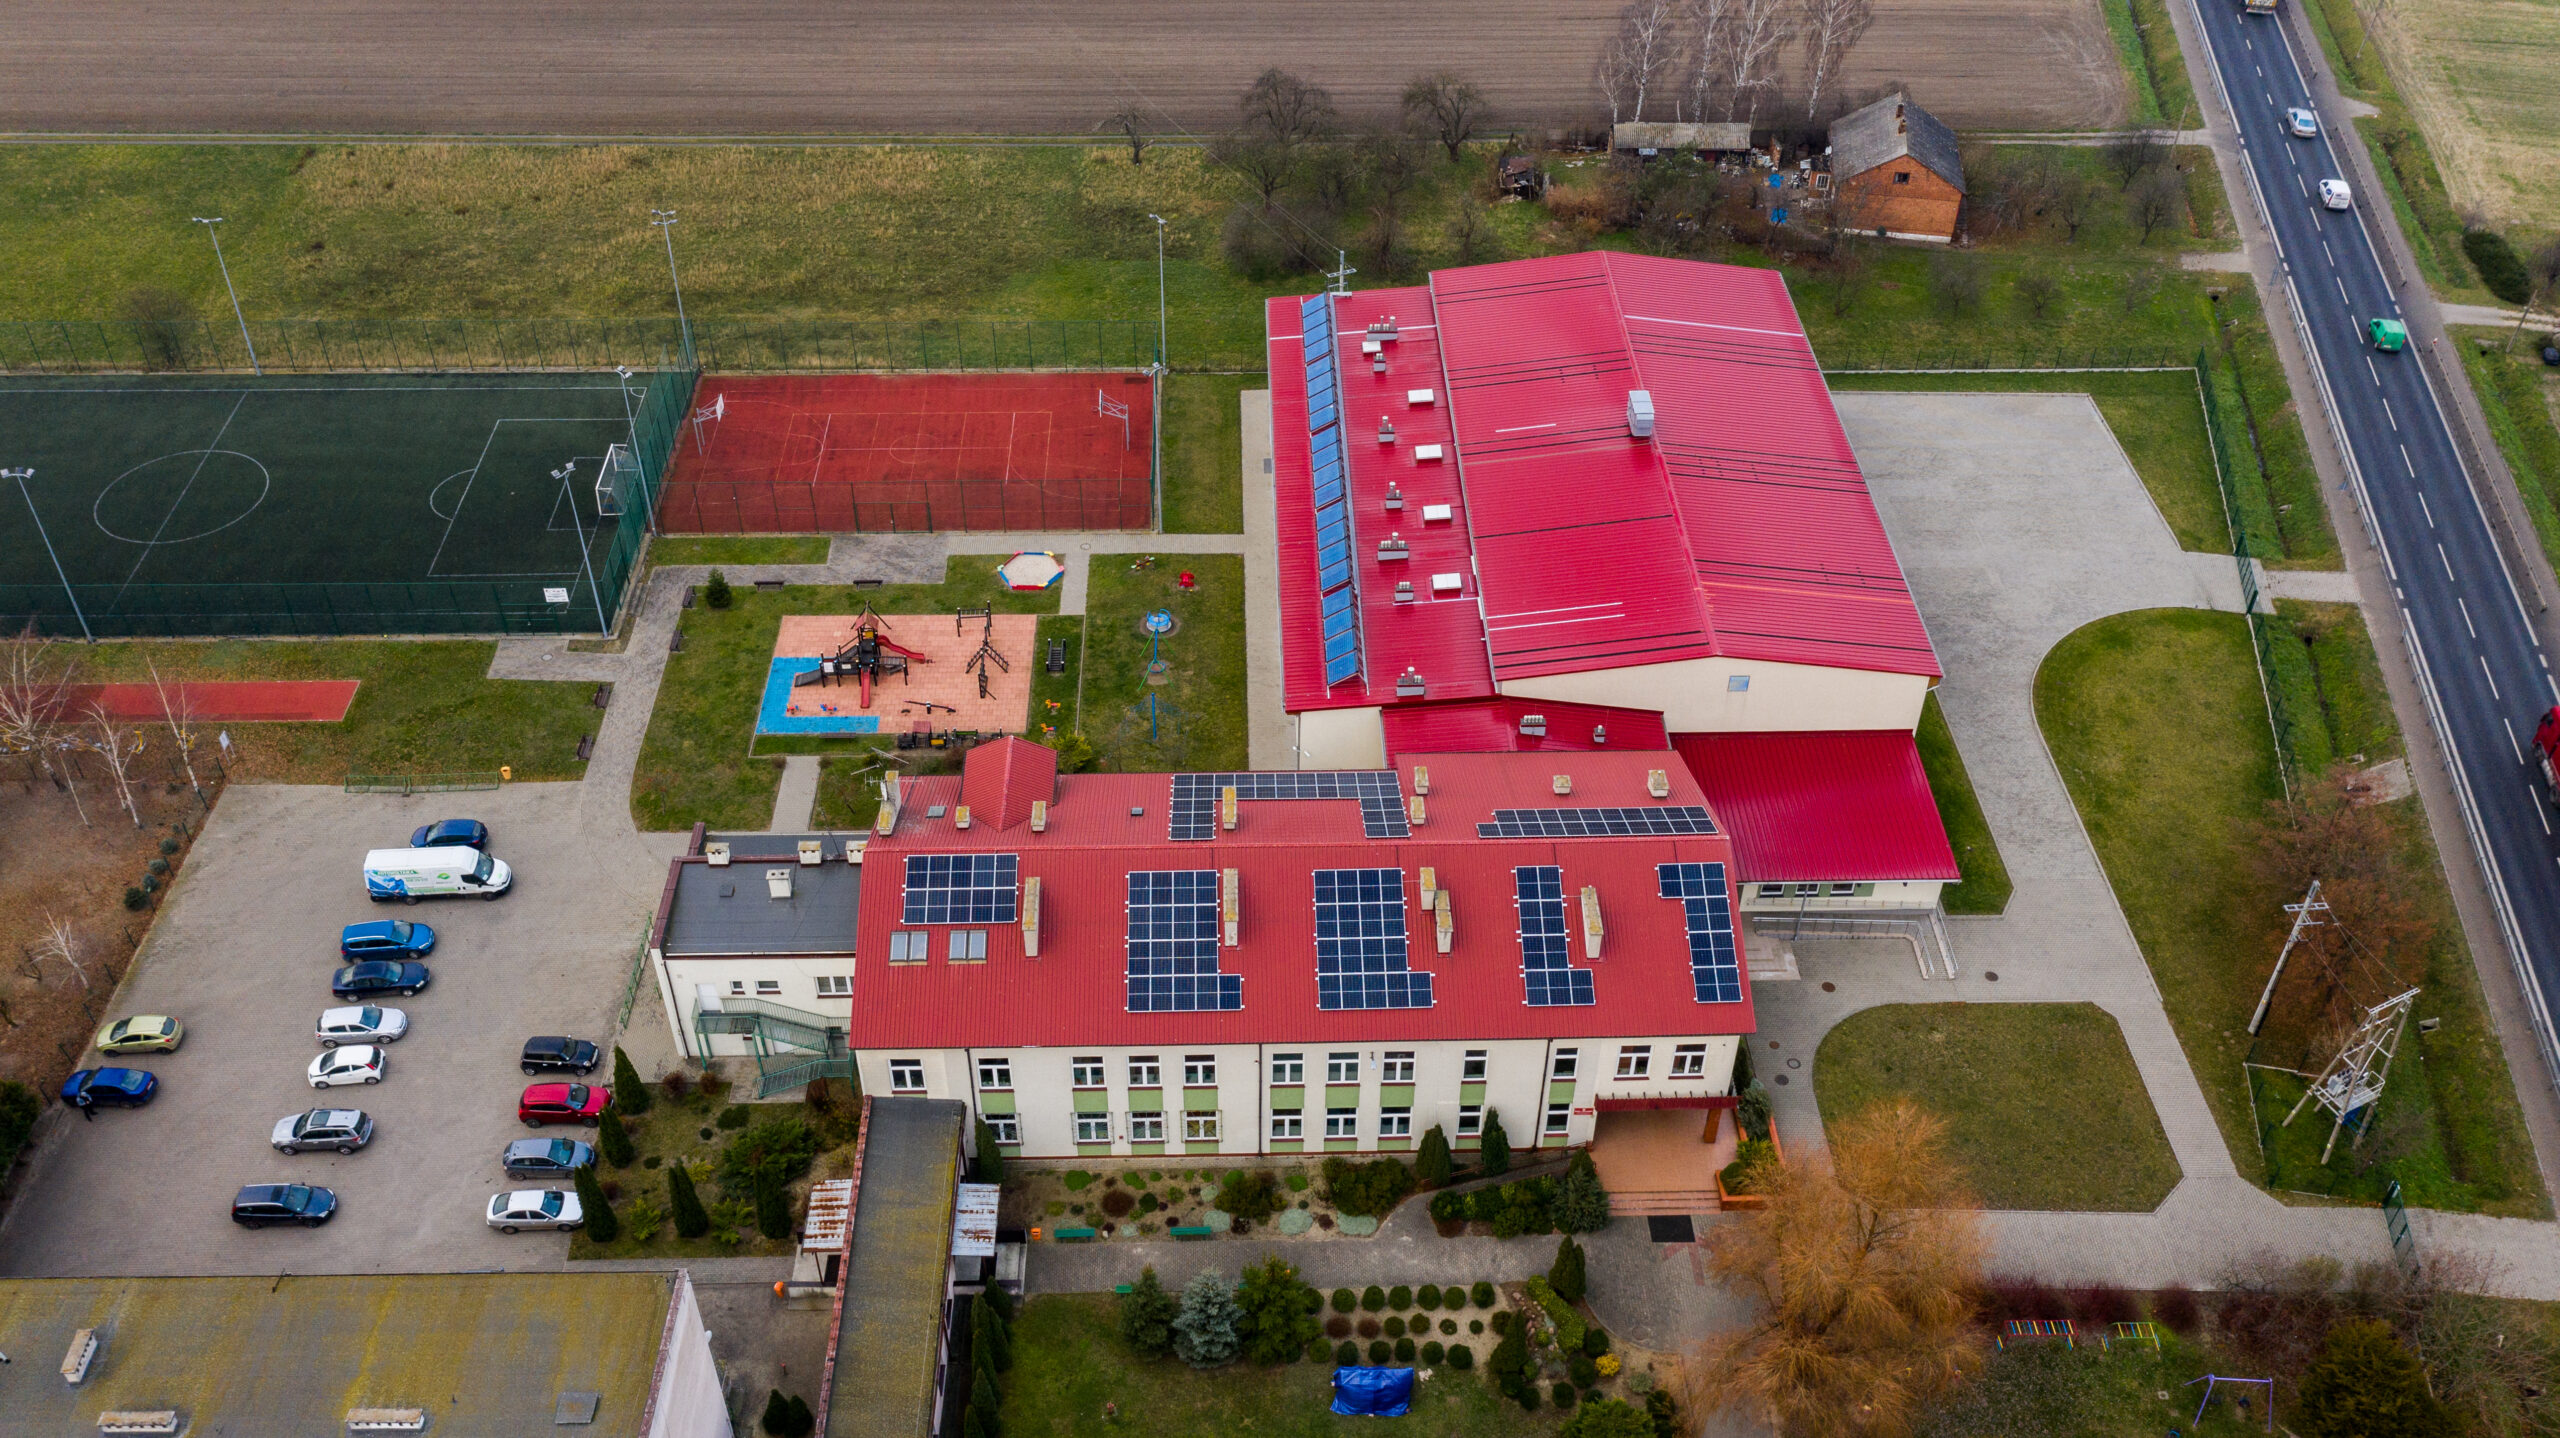 Zduny-PV-09.12.2020-4-scaled